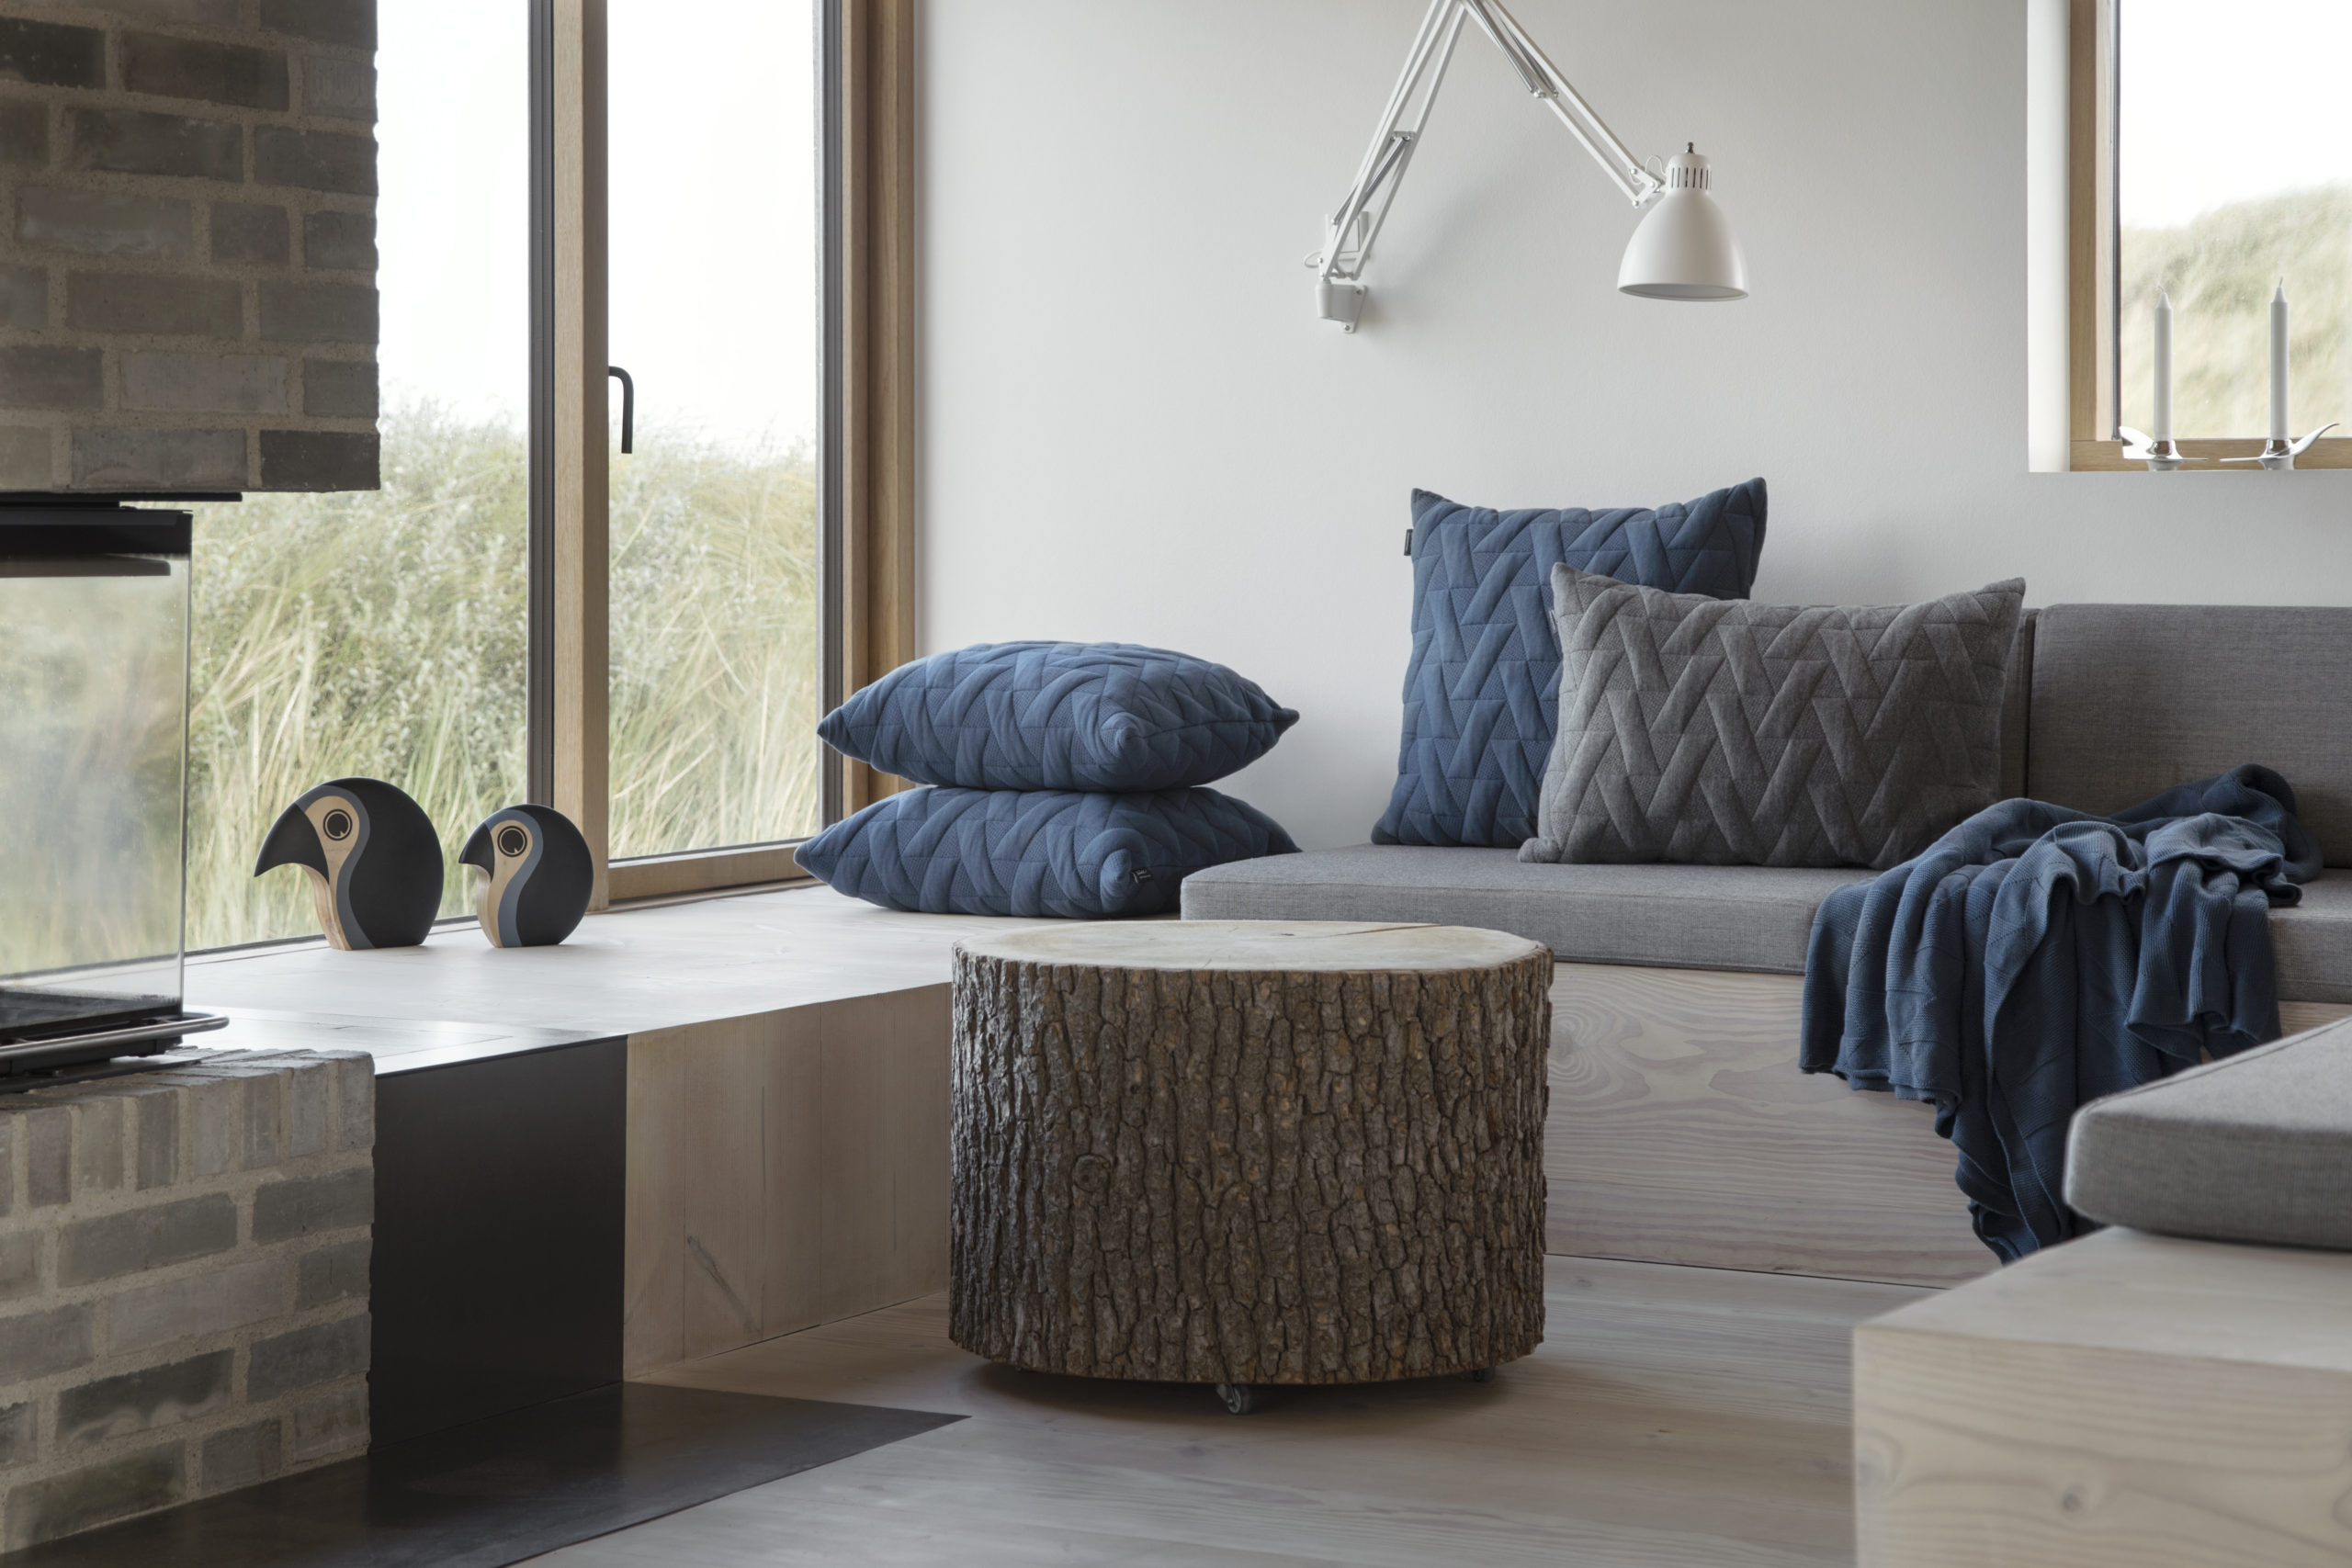 Architectmade-FJ-Pattern-Organic-Cotton-Pillows-Blankets-Denmark-Finn-Juhl-1